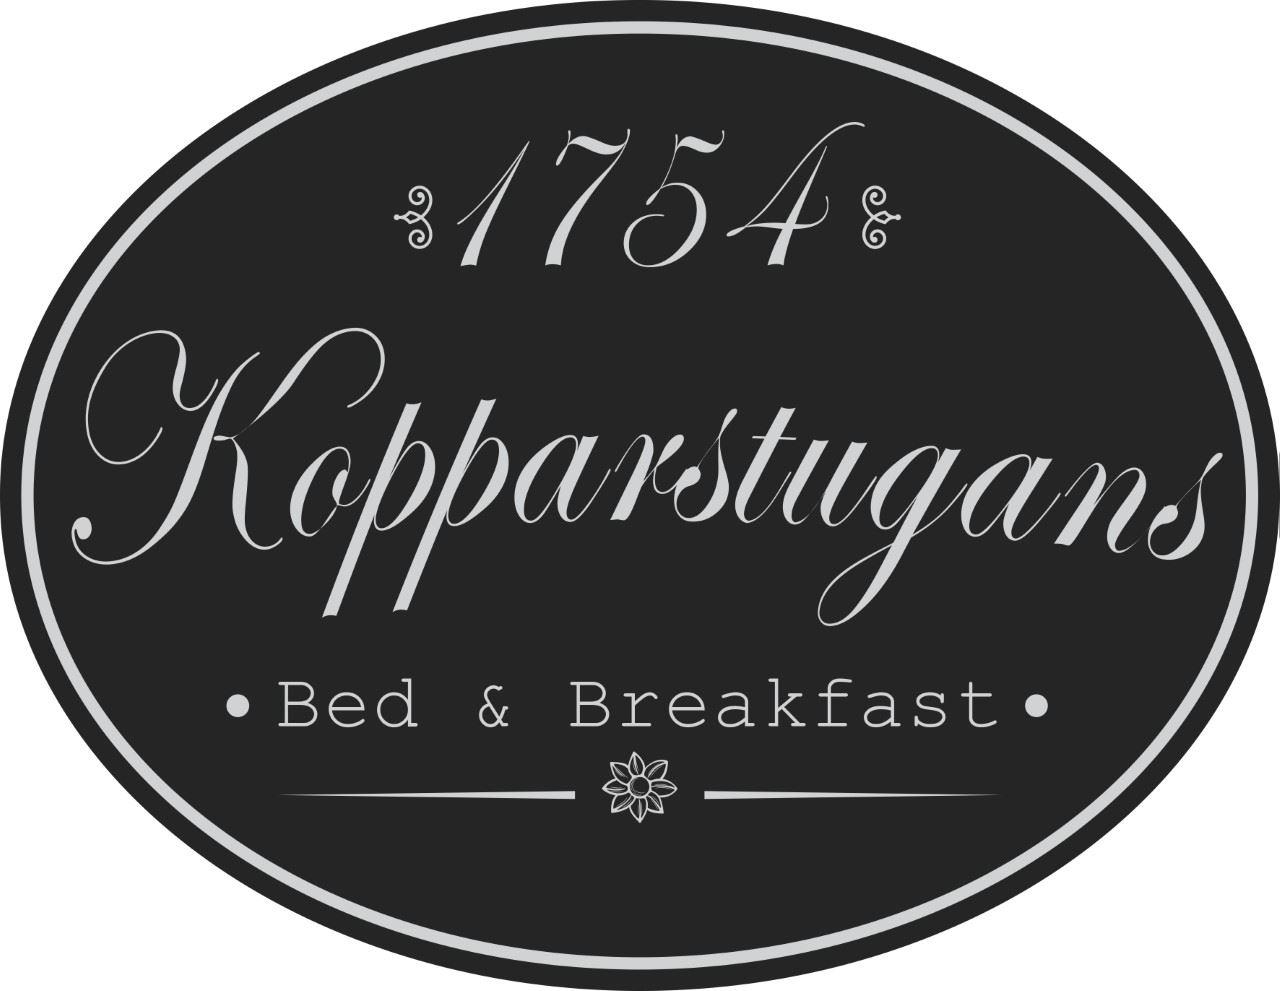 Kopparstugans Bed & Breakfast